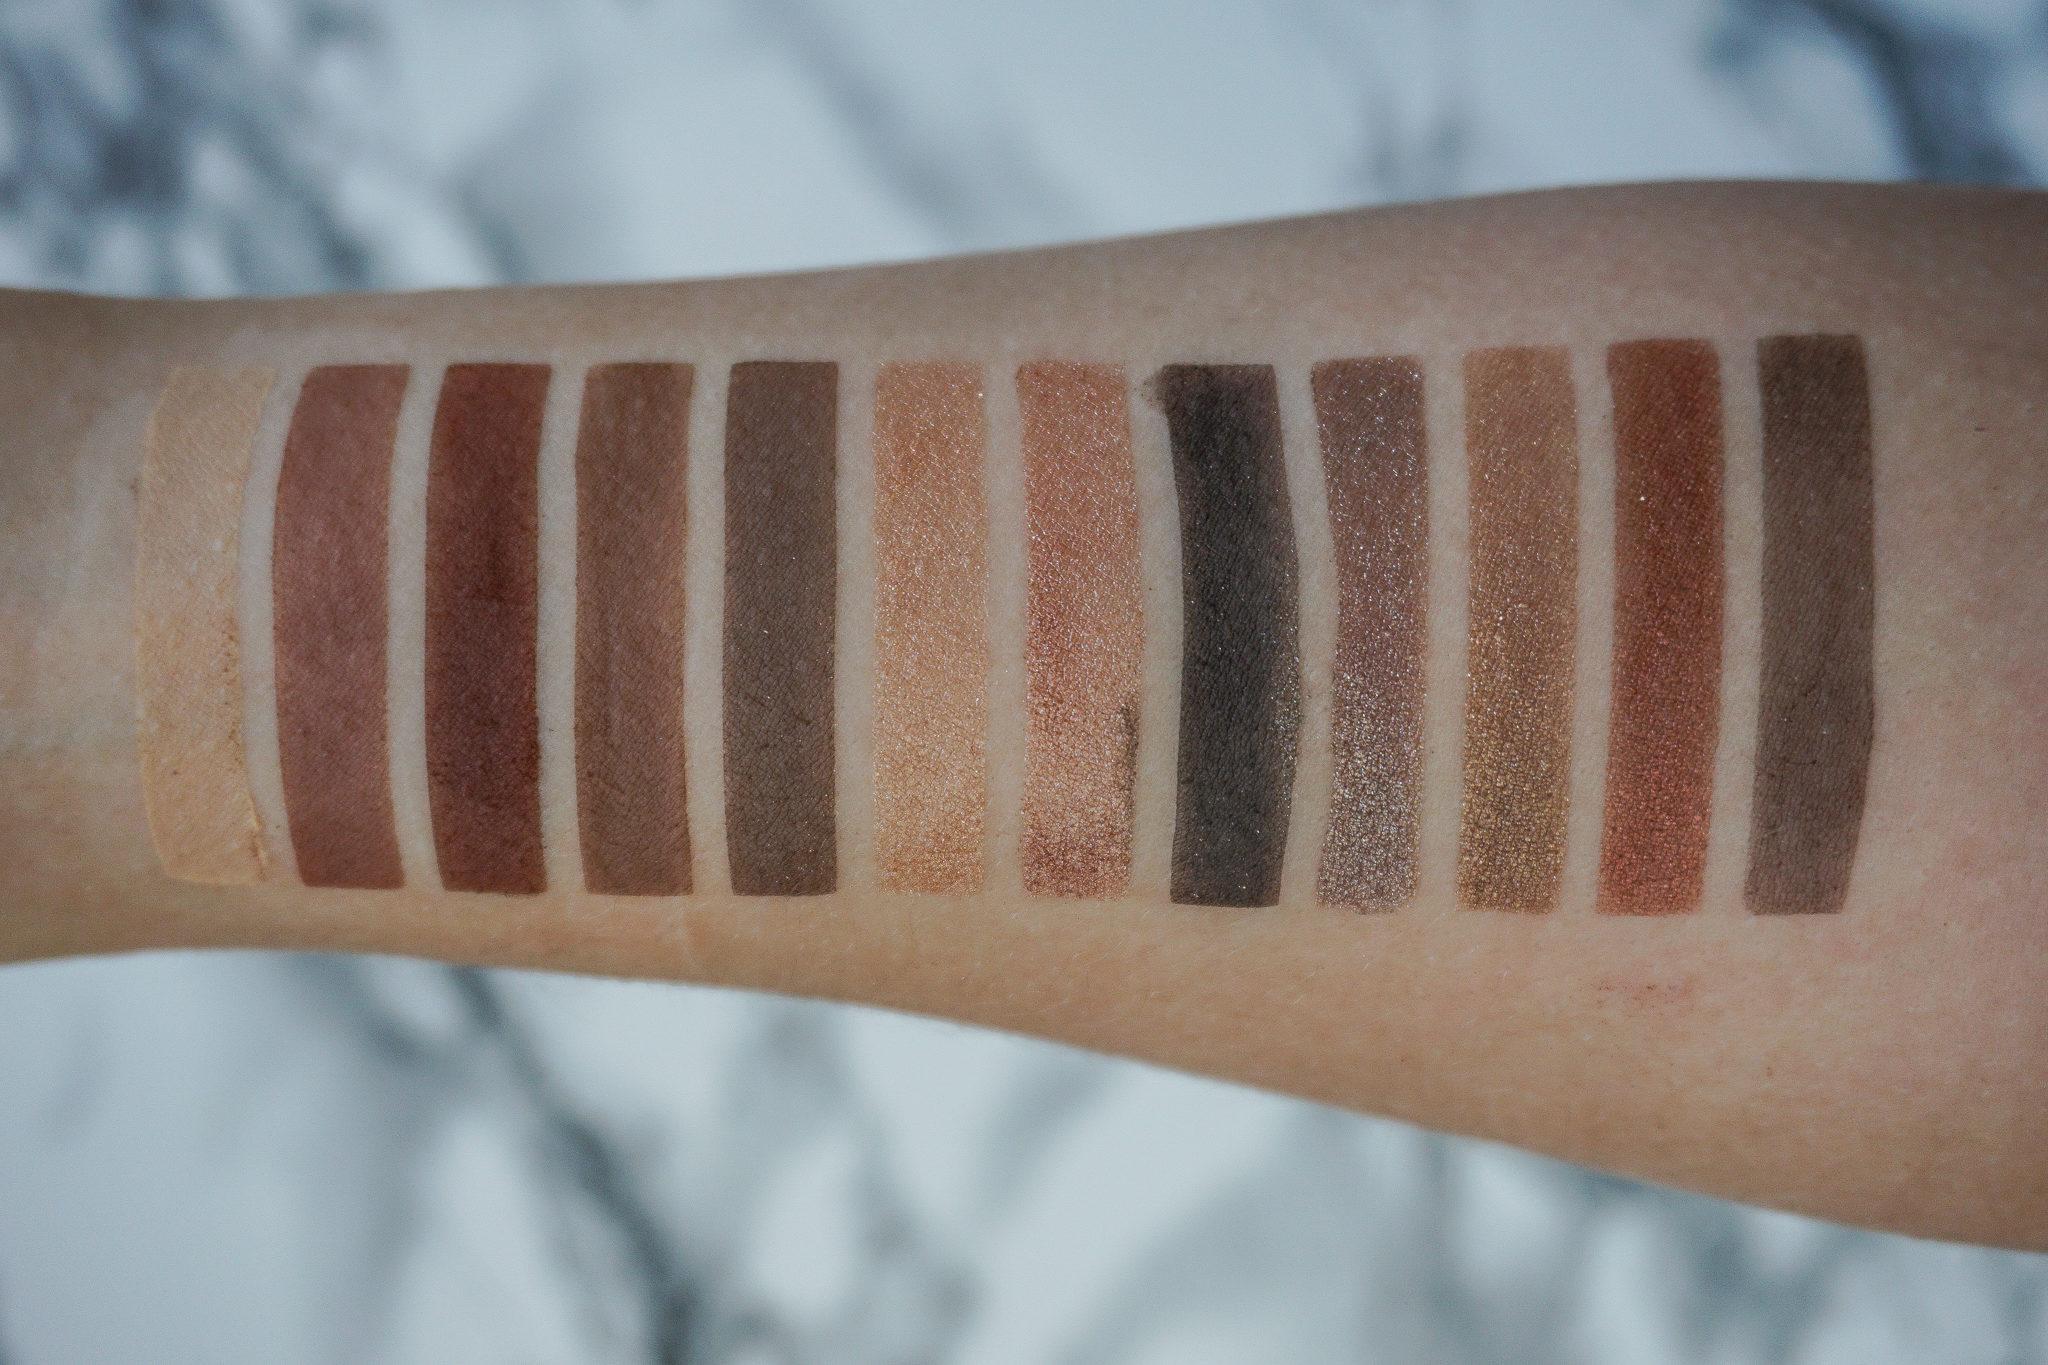 NARS Skin Deep Eye Palette Swatches